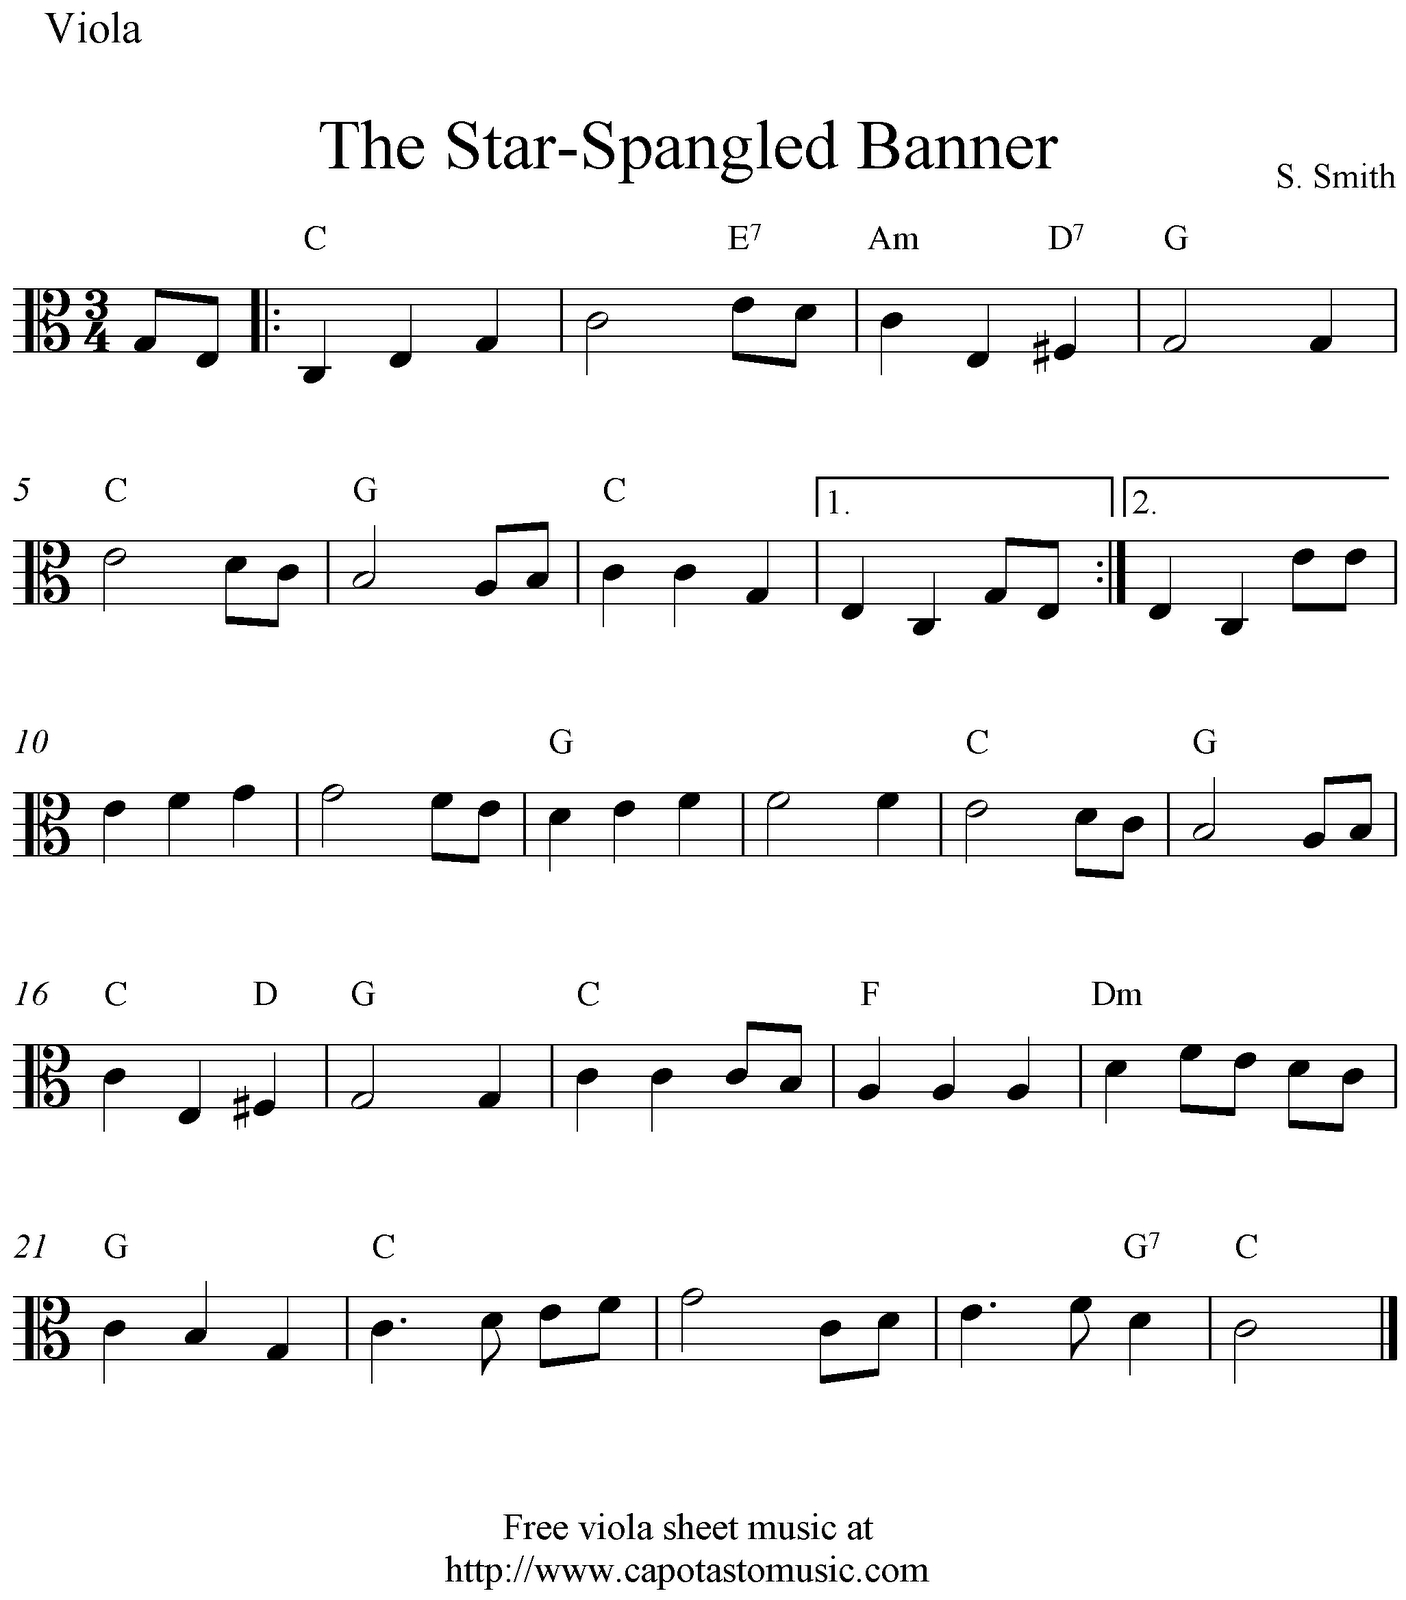 Free Viola Sheet Music, The Star-Spangled Banner - Viola Sheet Music Free Printable